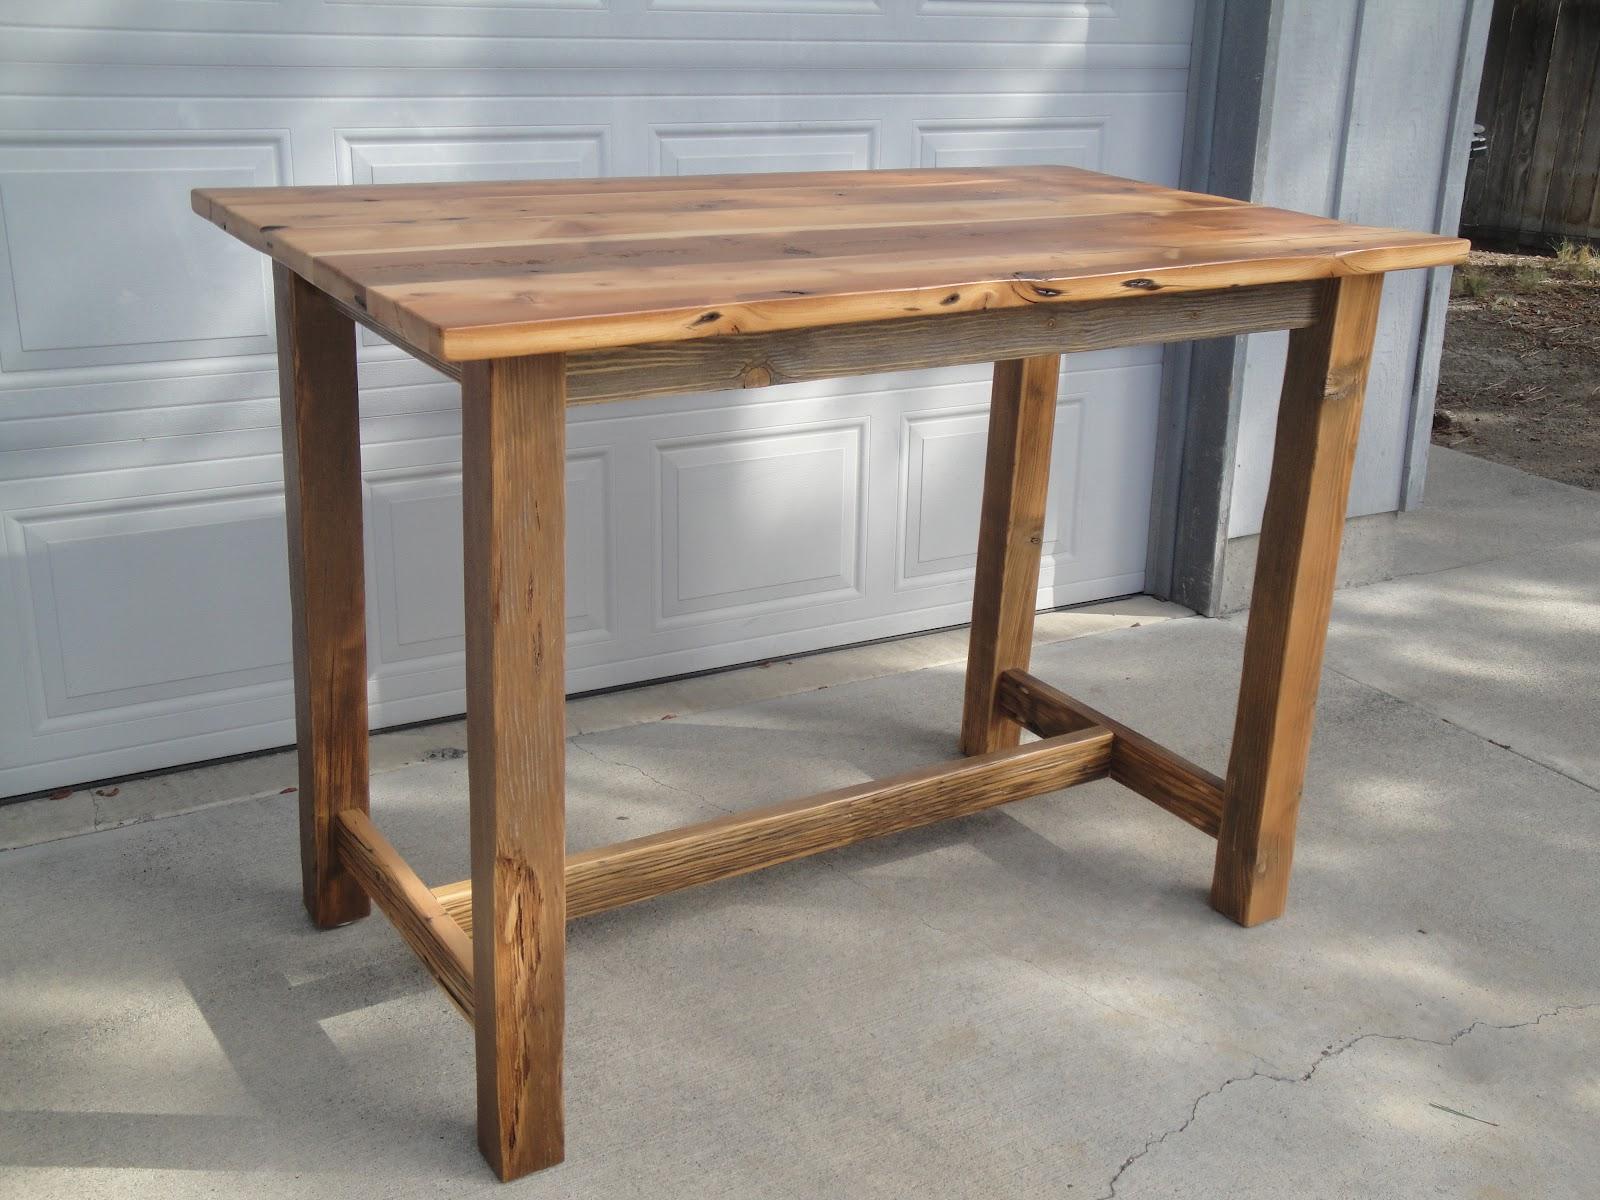 Carlseng Designs: Reclaimed Wood Table